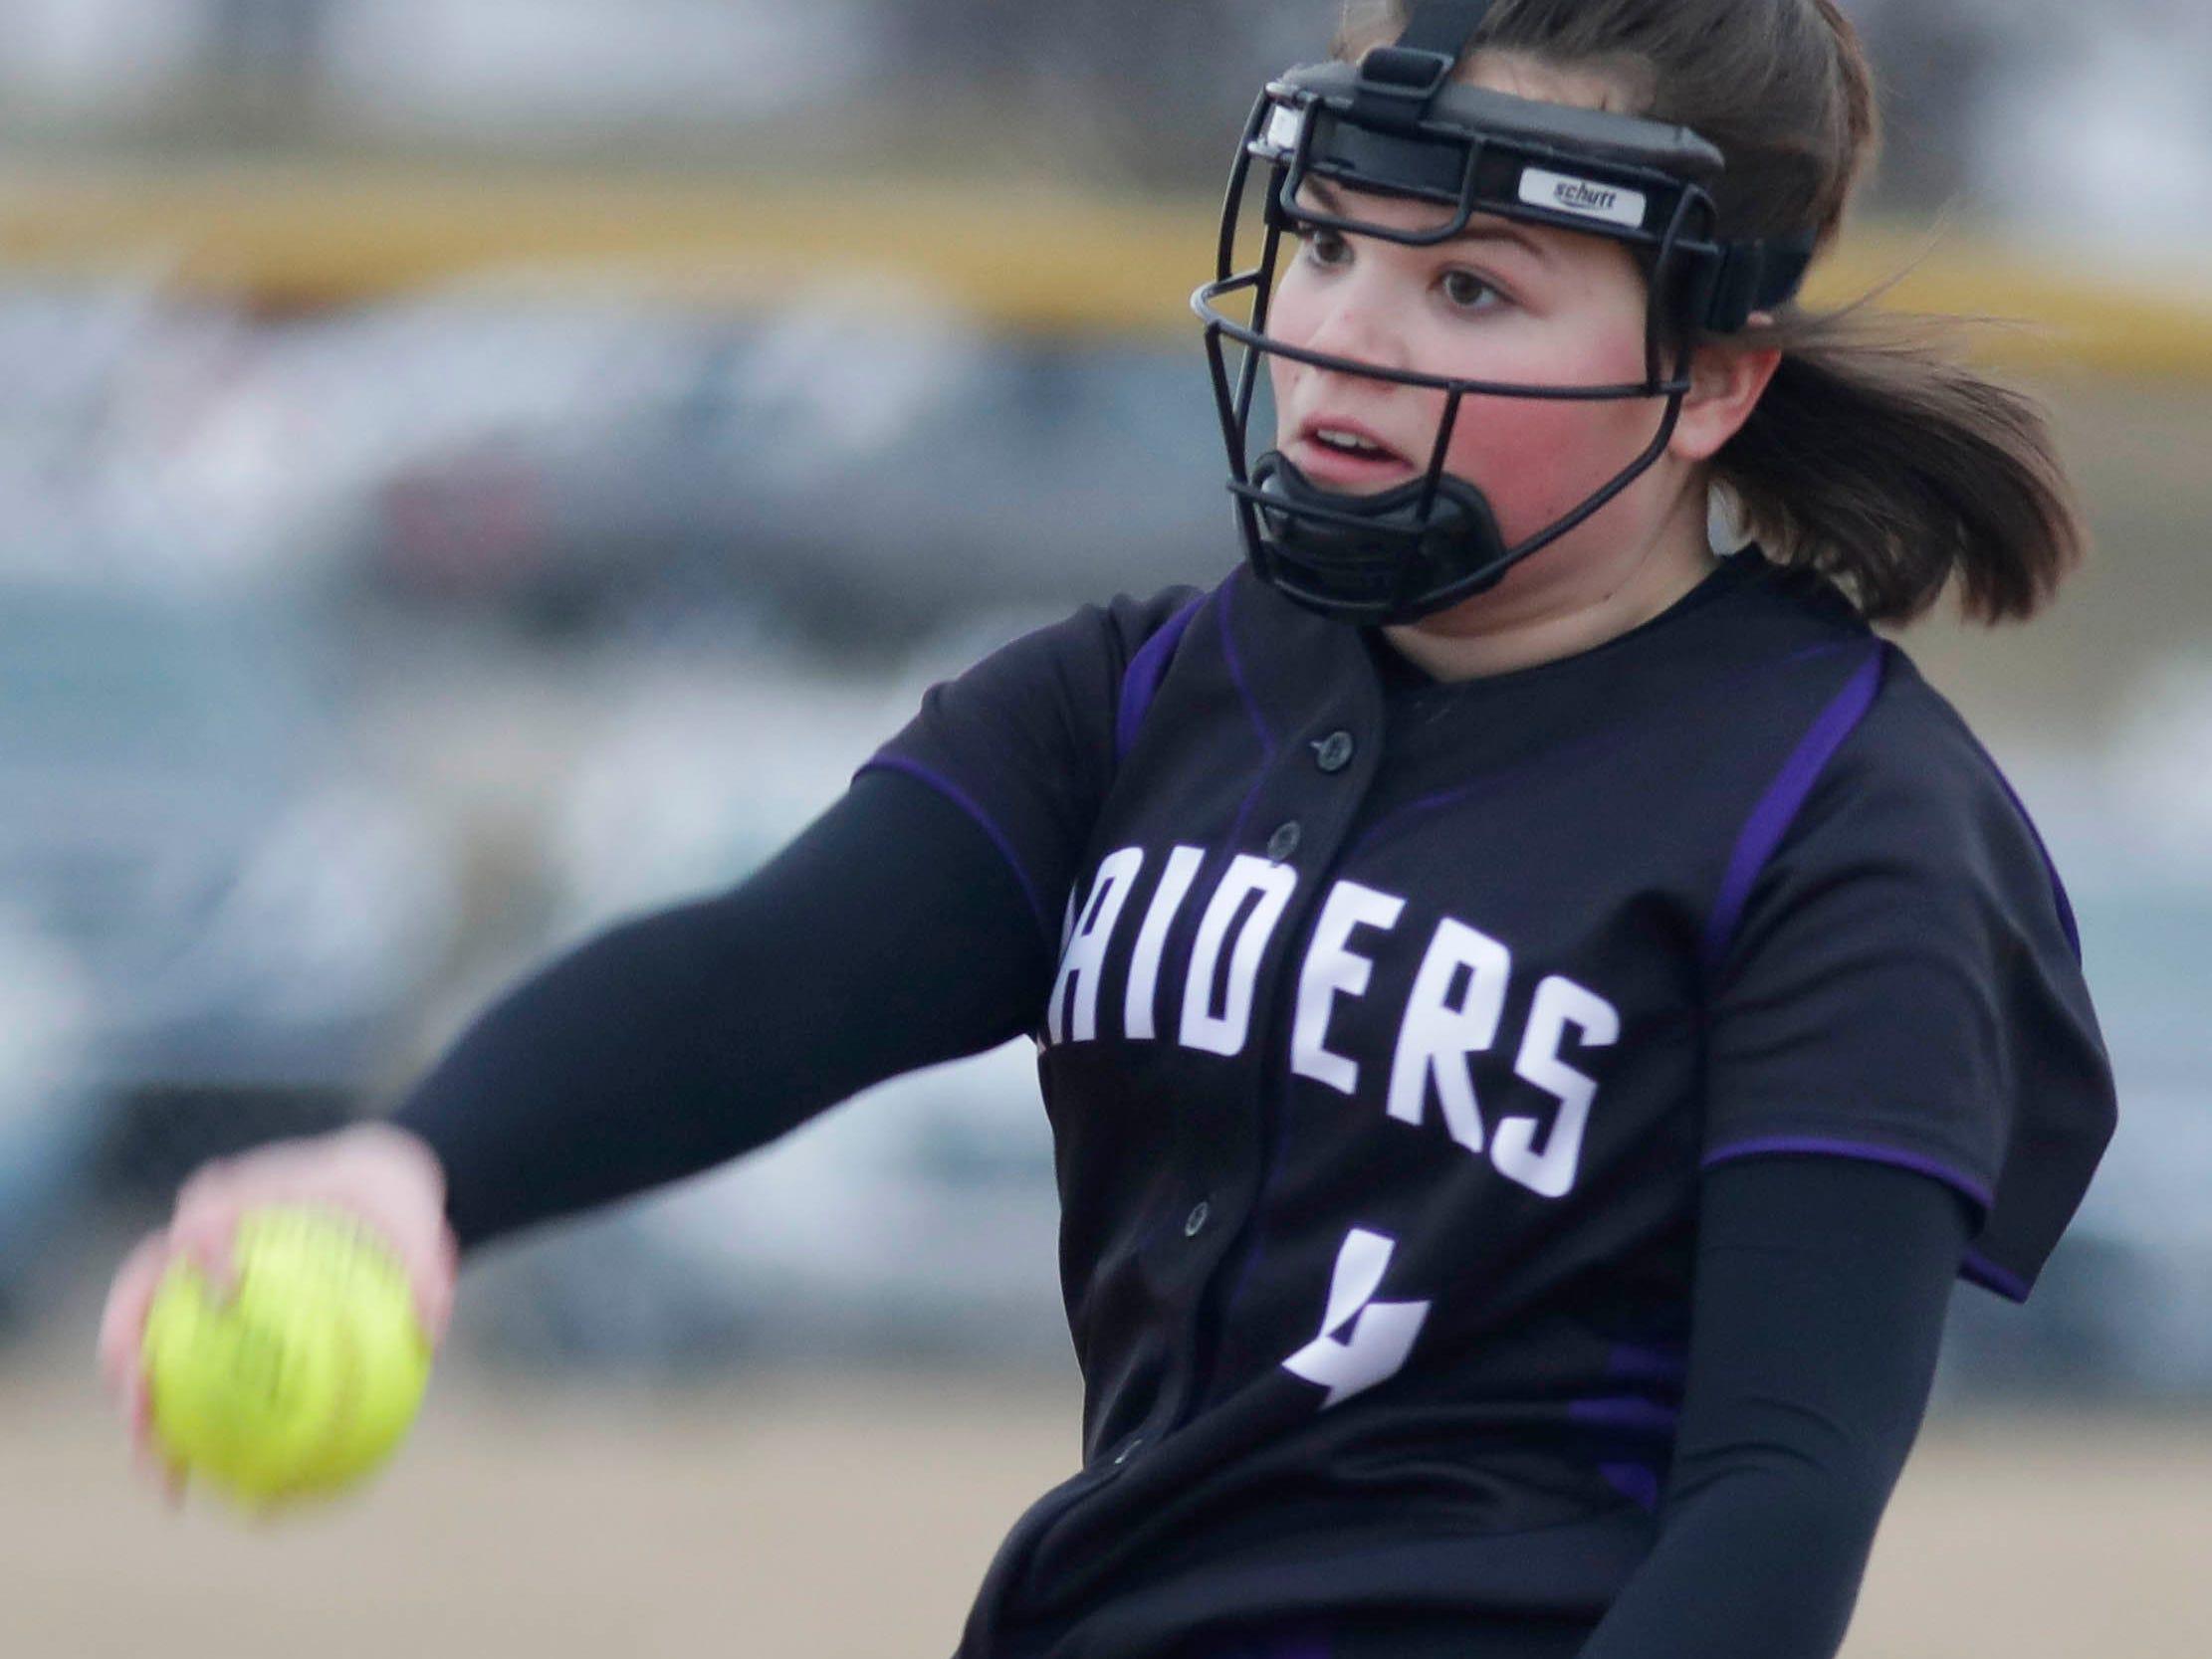 Kiel's Erin Swanson (4) winds up a pitch against Winnebago Lutheran, Thursday, March 28, 2019, in Fond du Lac, Wis.